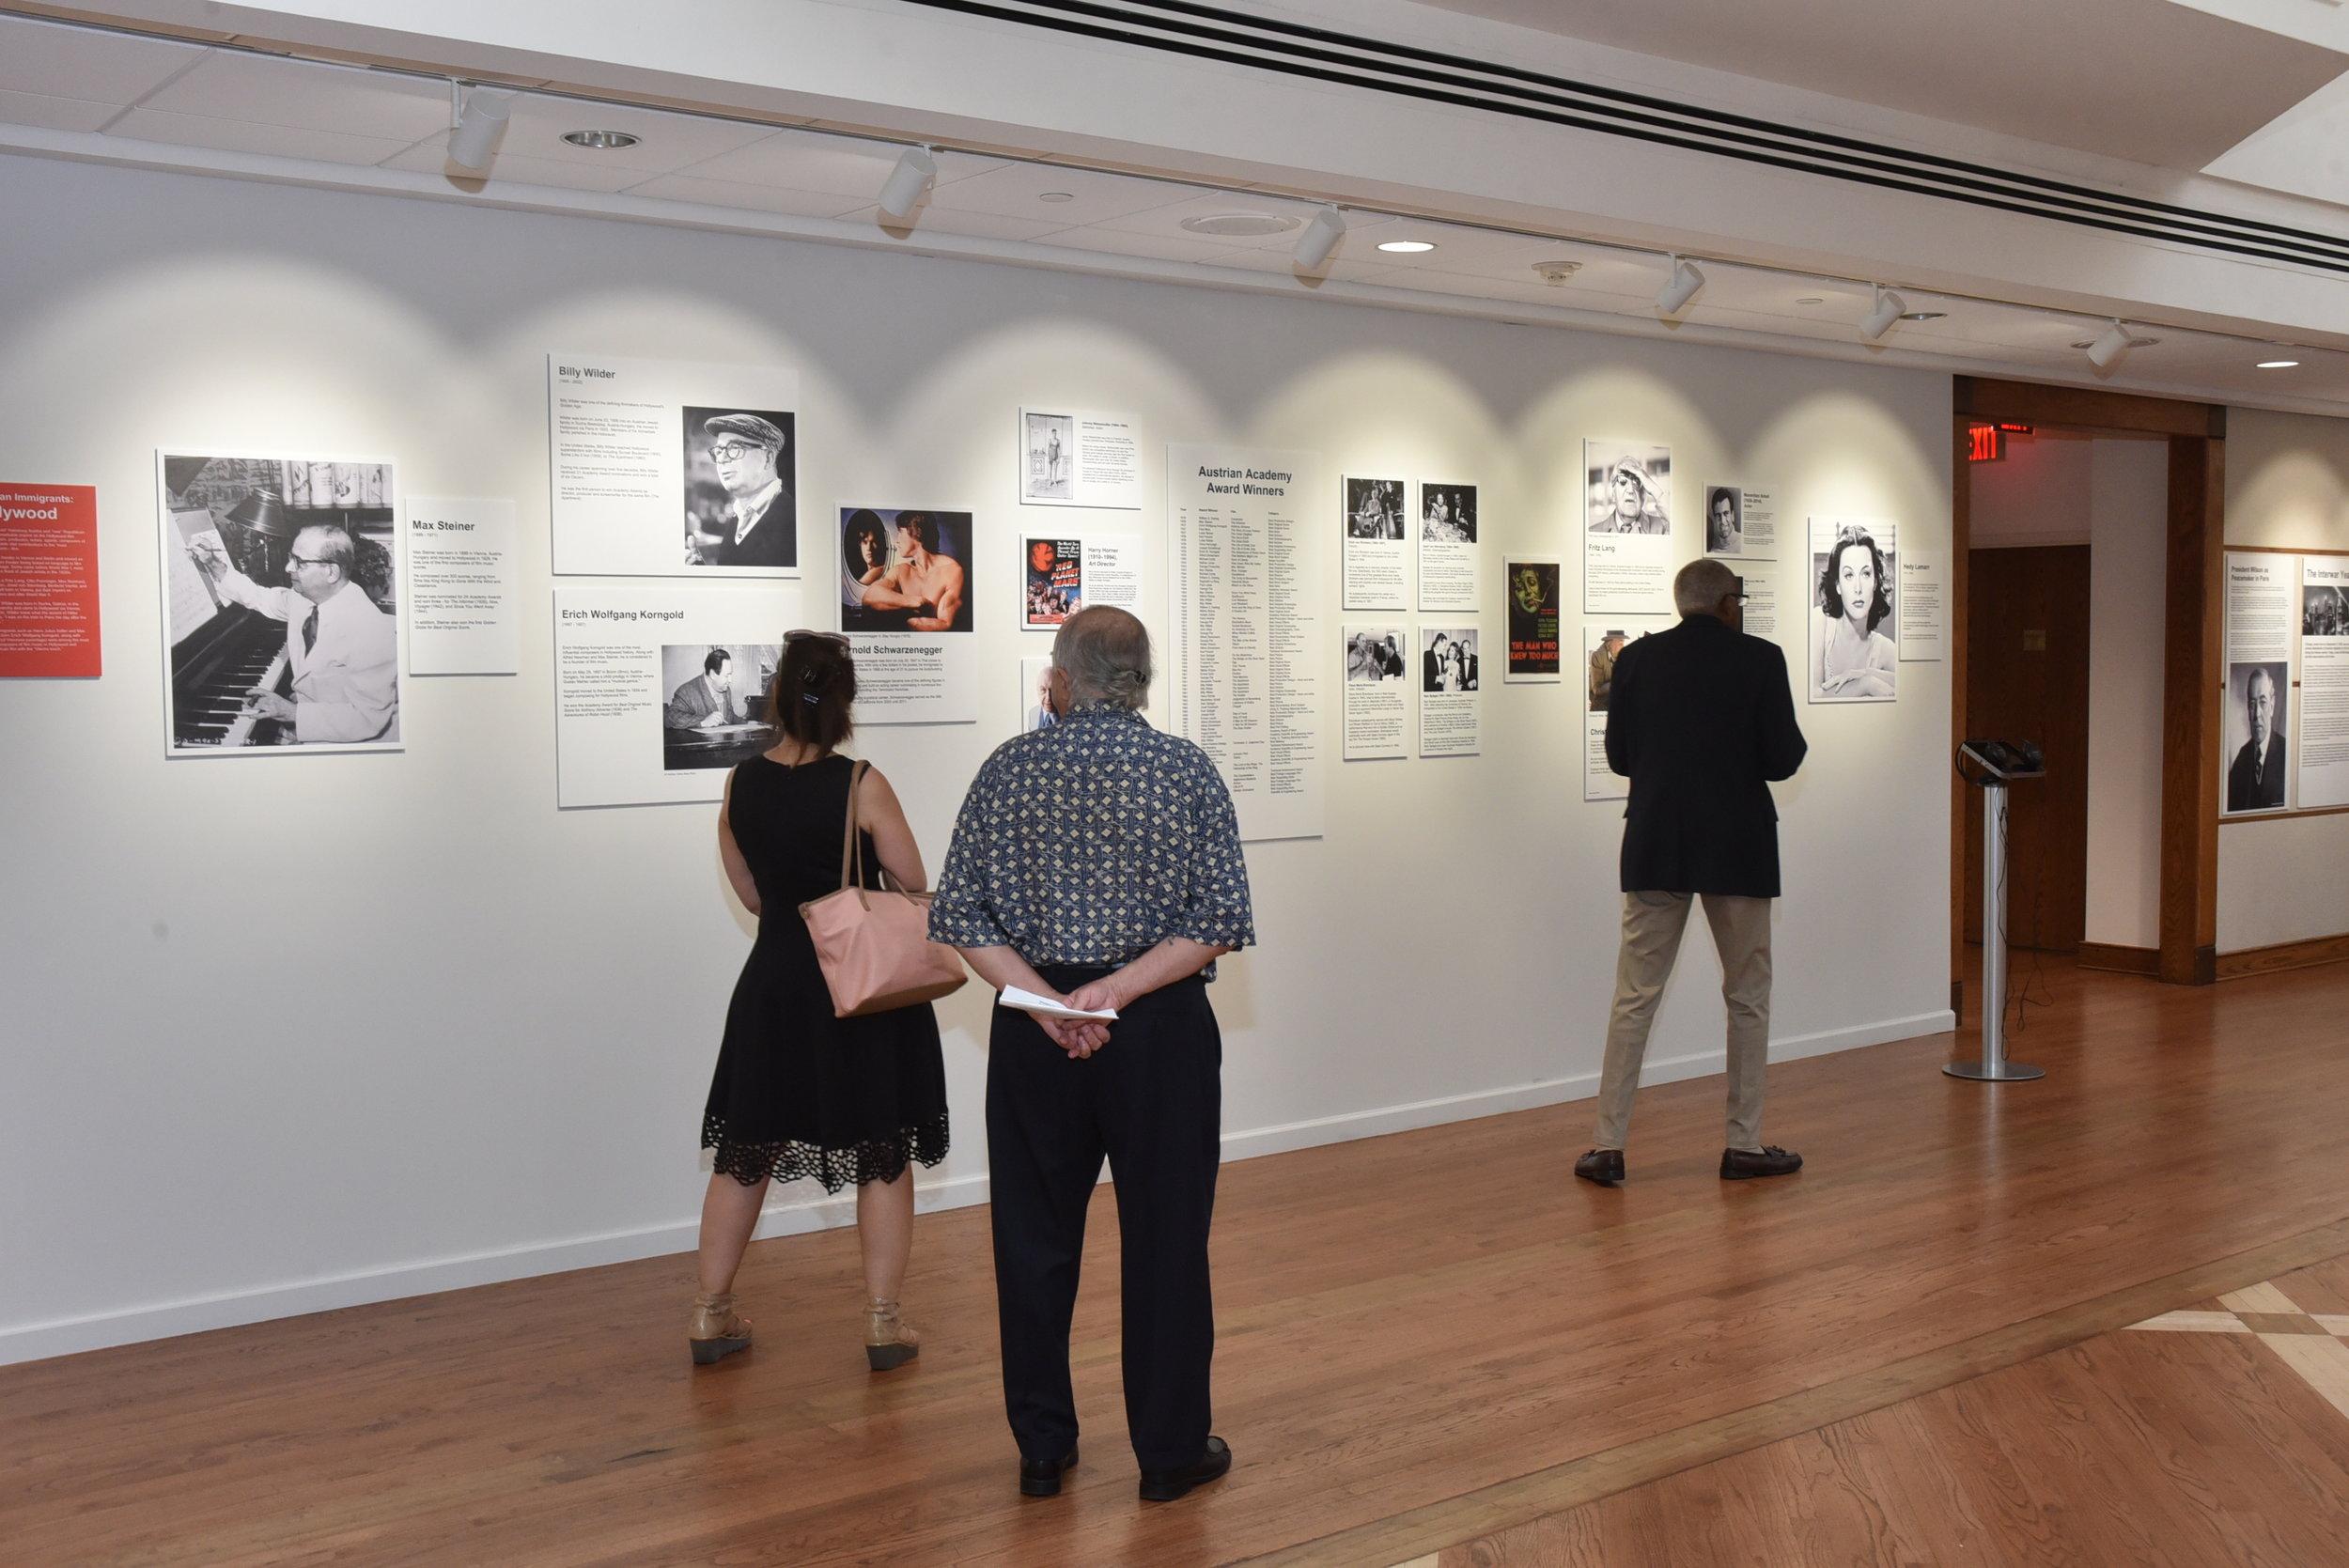 Guests viewing the exhibit  Photo: Peter Alunans